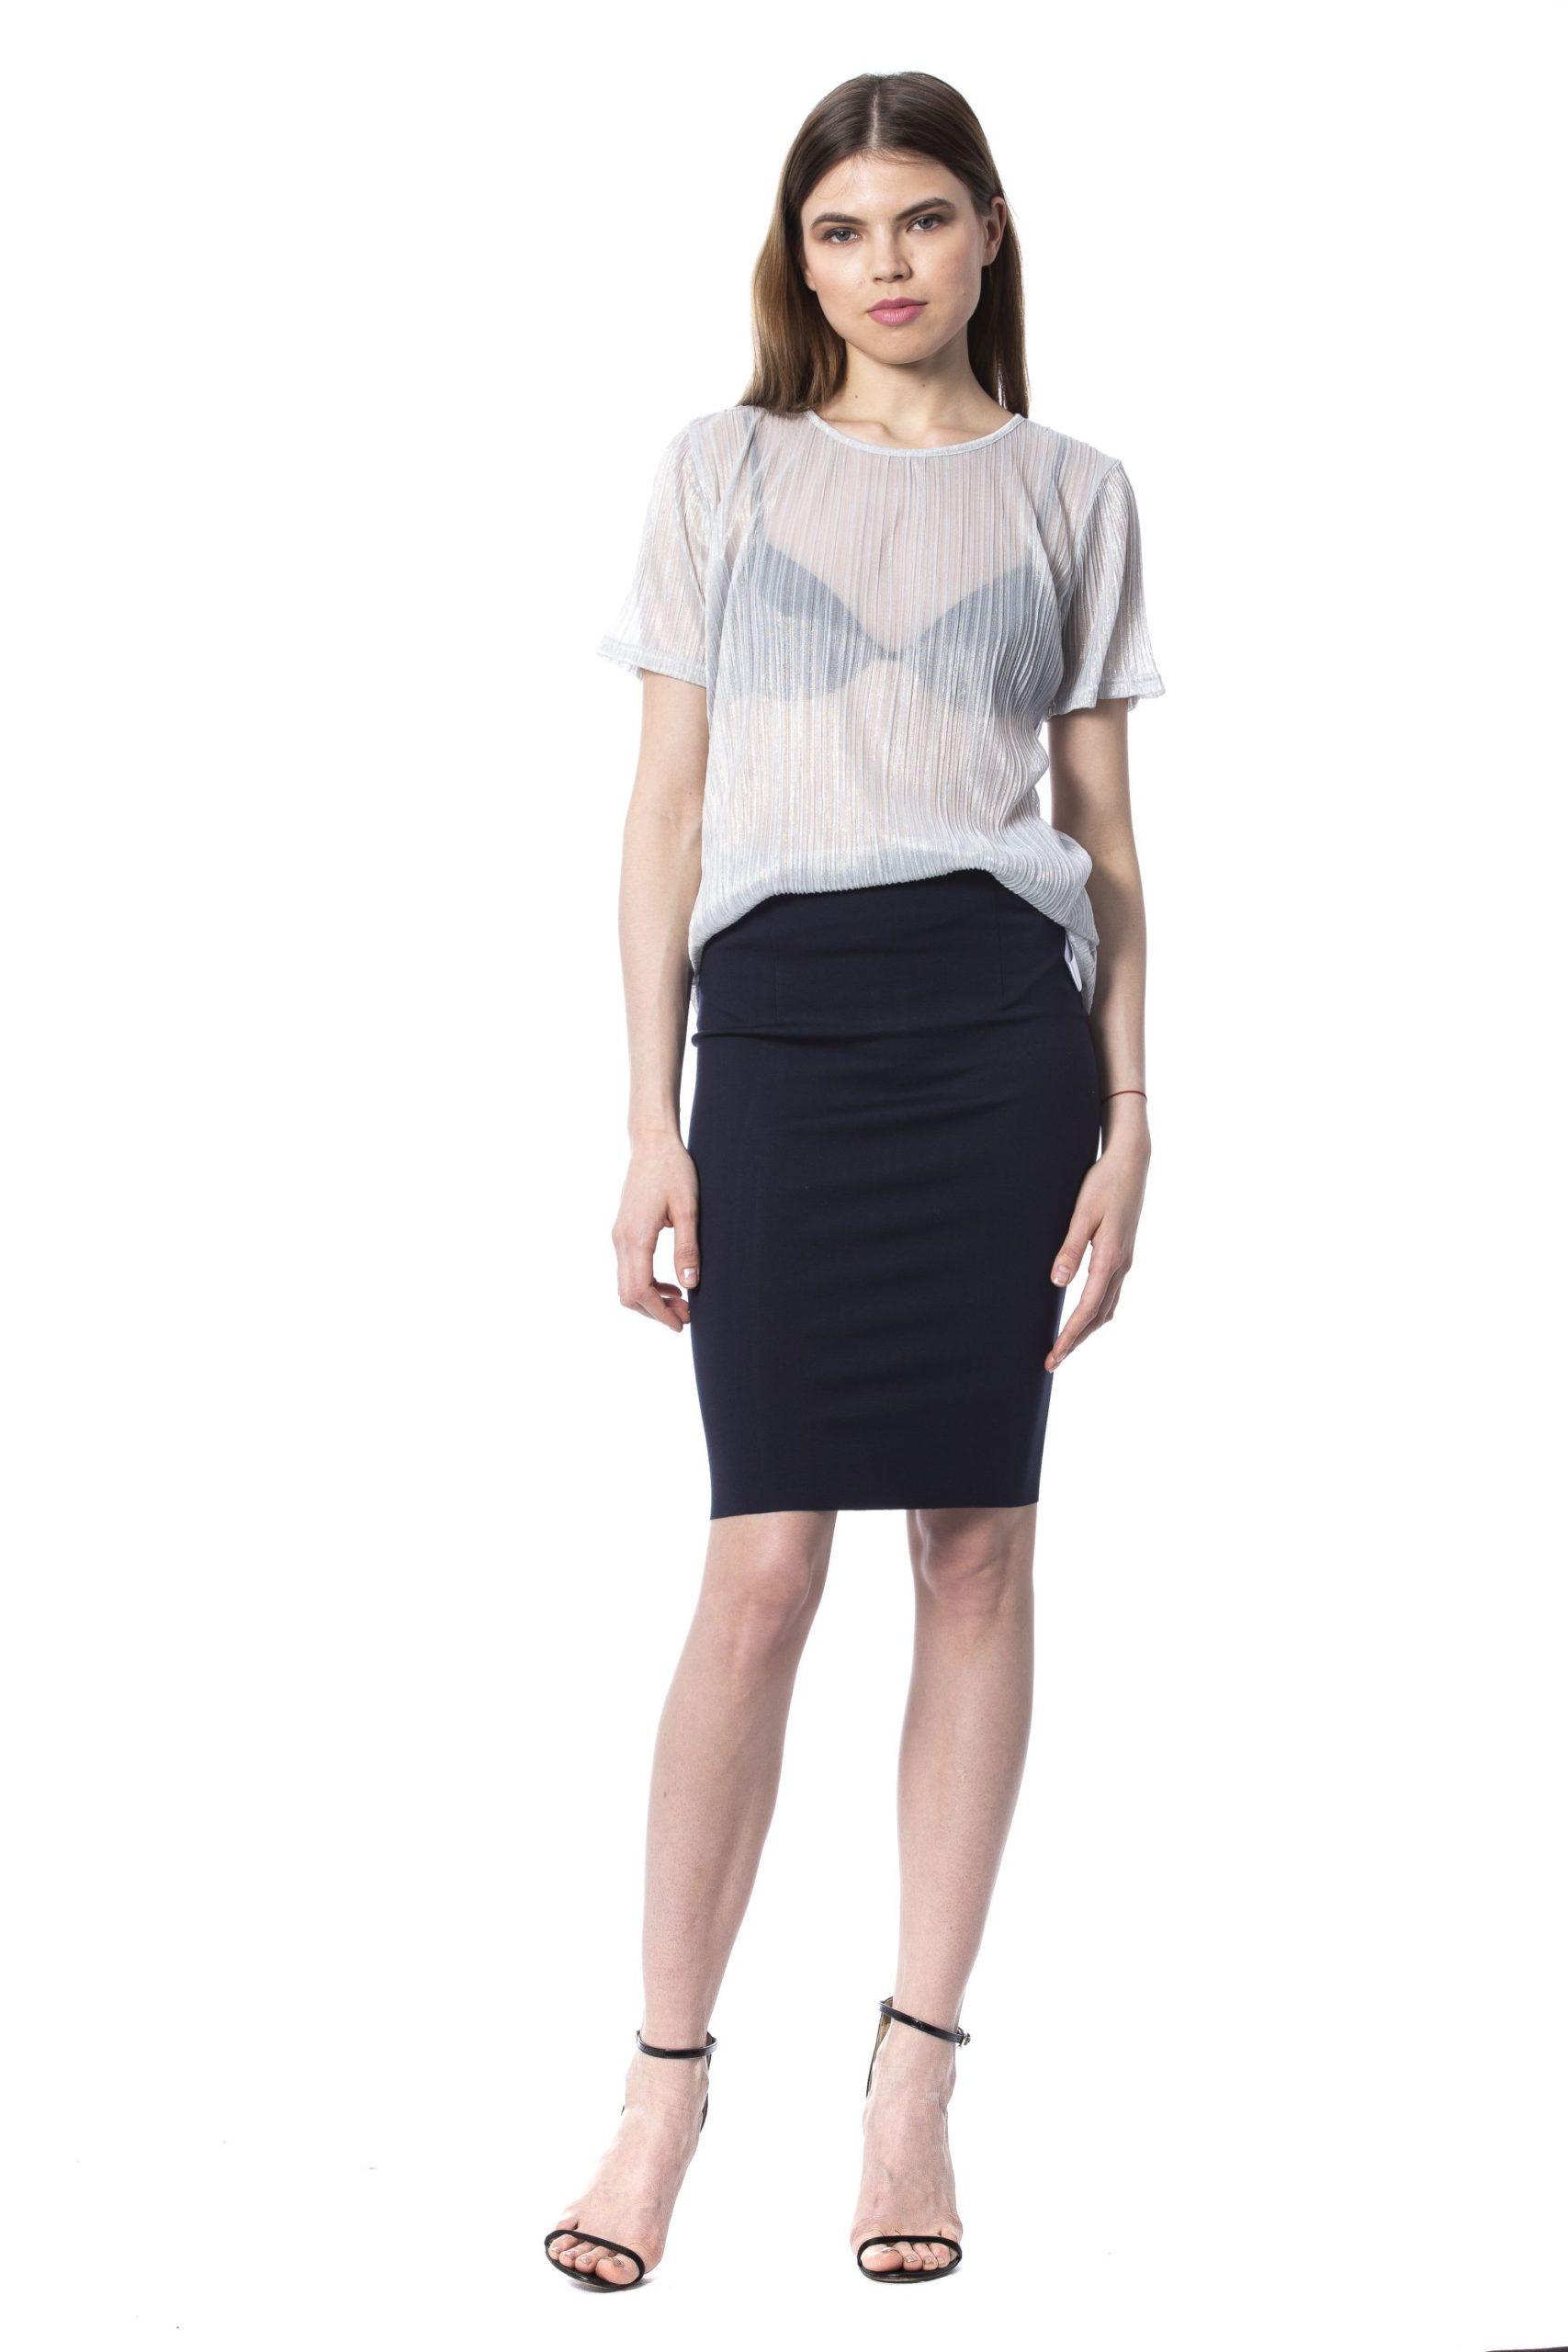 Silvian Heach Women's T-Shirt Silver SI1235500 - XS